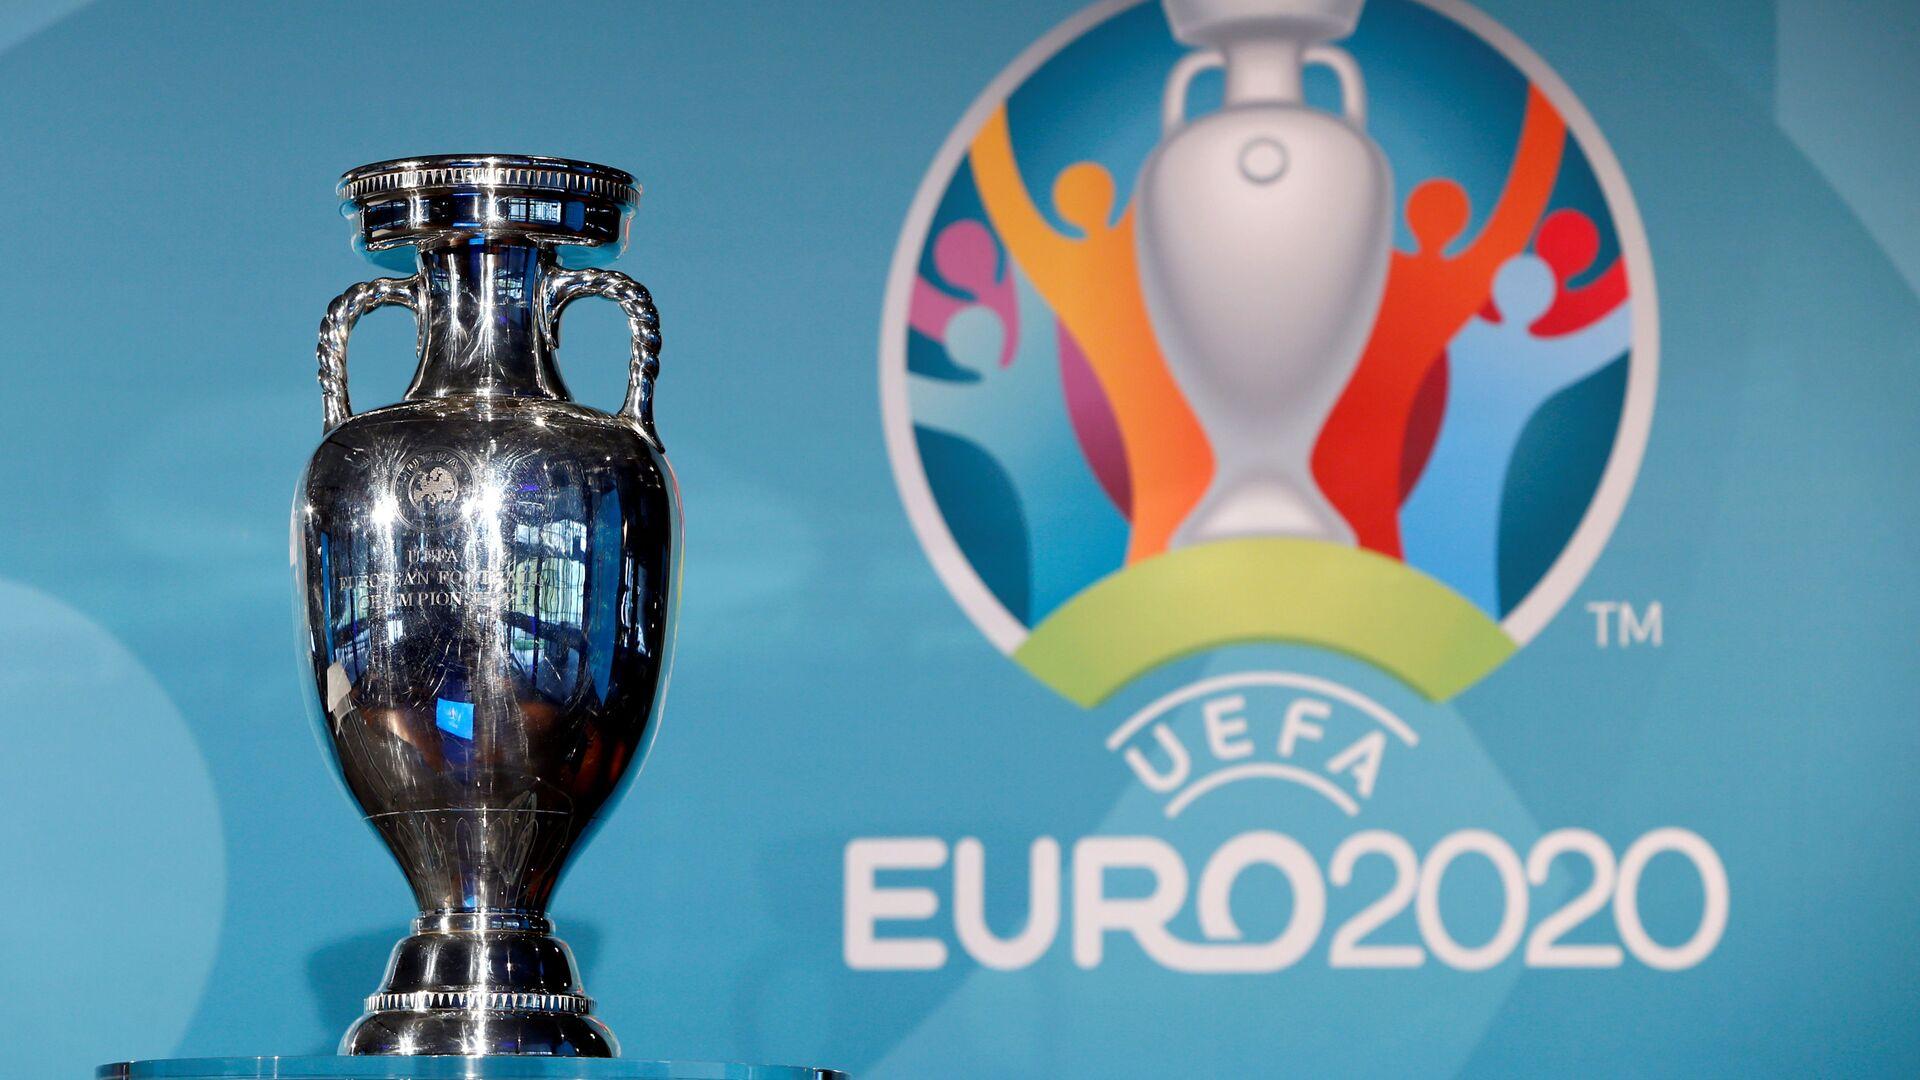 Eurocopa 2020 - Sputnik Mundo, 1920, 25.03.2021